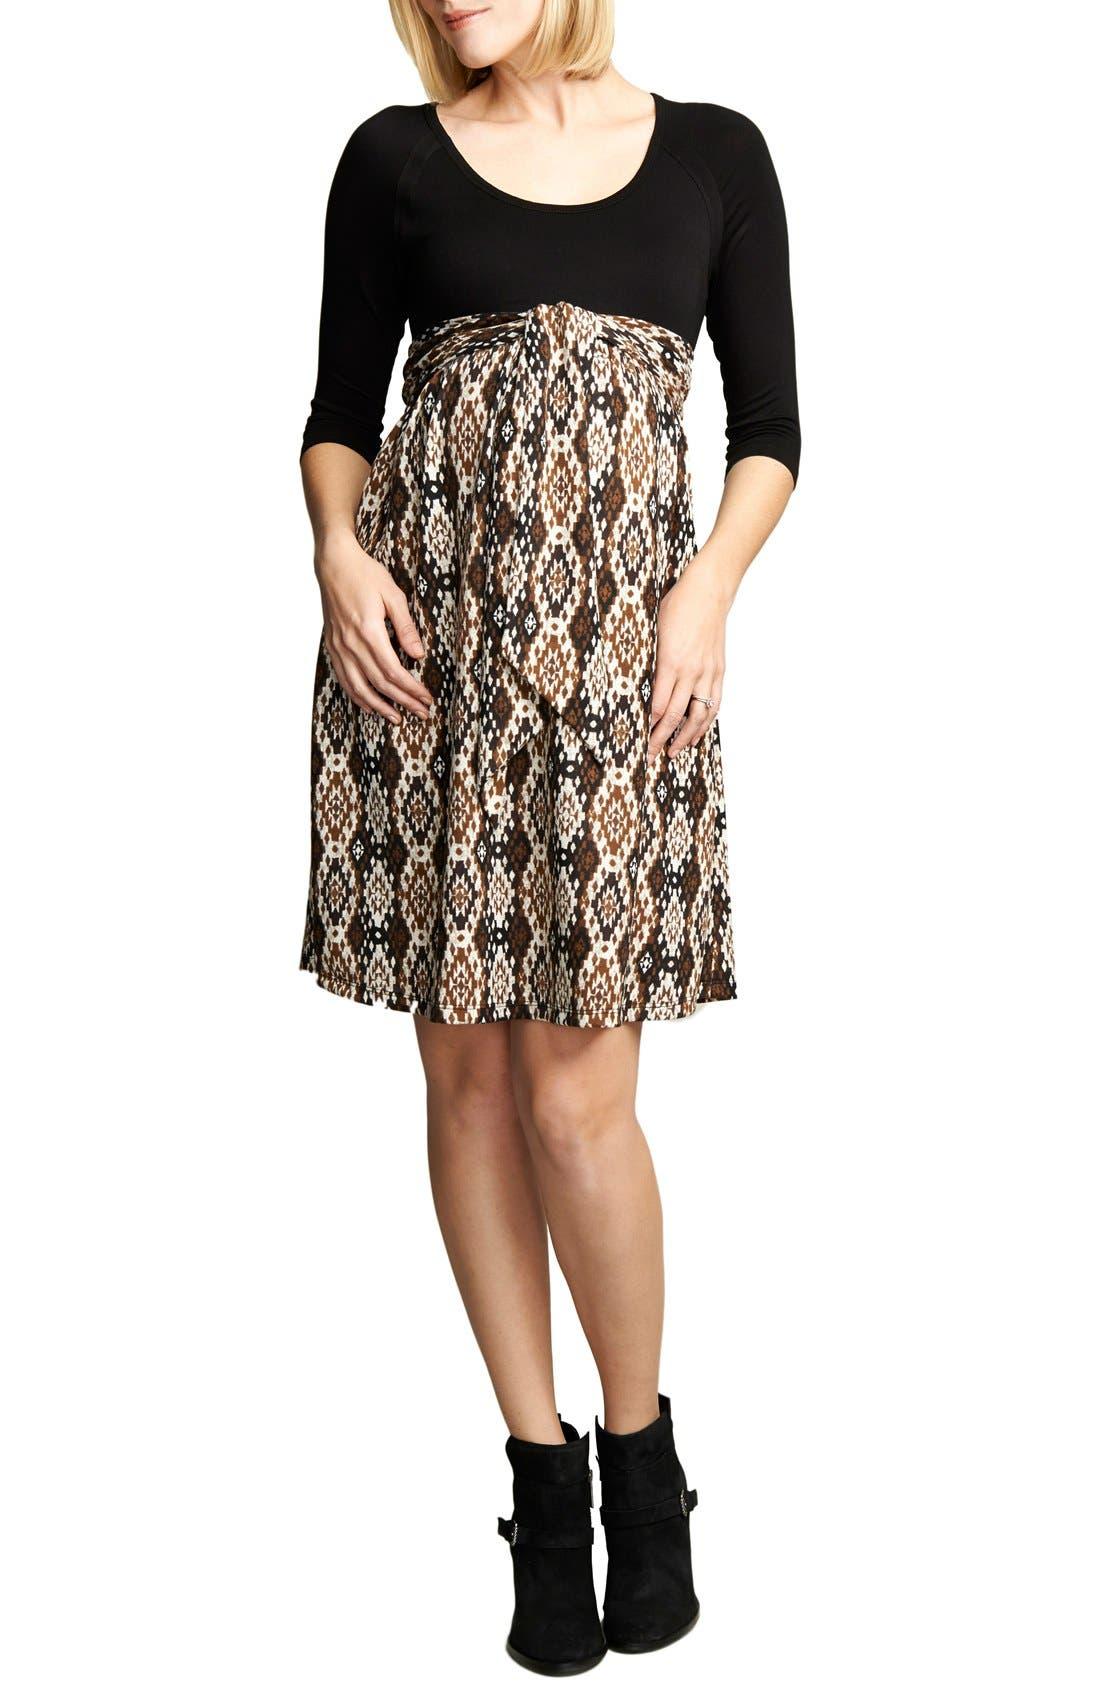 Ikat Print Tie Front Dress,                             Main thumbnail 1, color,                             BLACK/IKAT PRINT